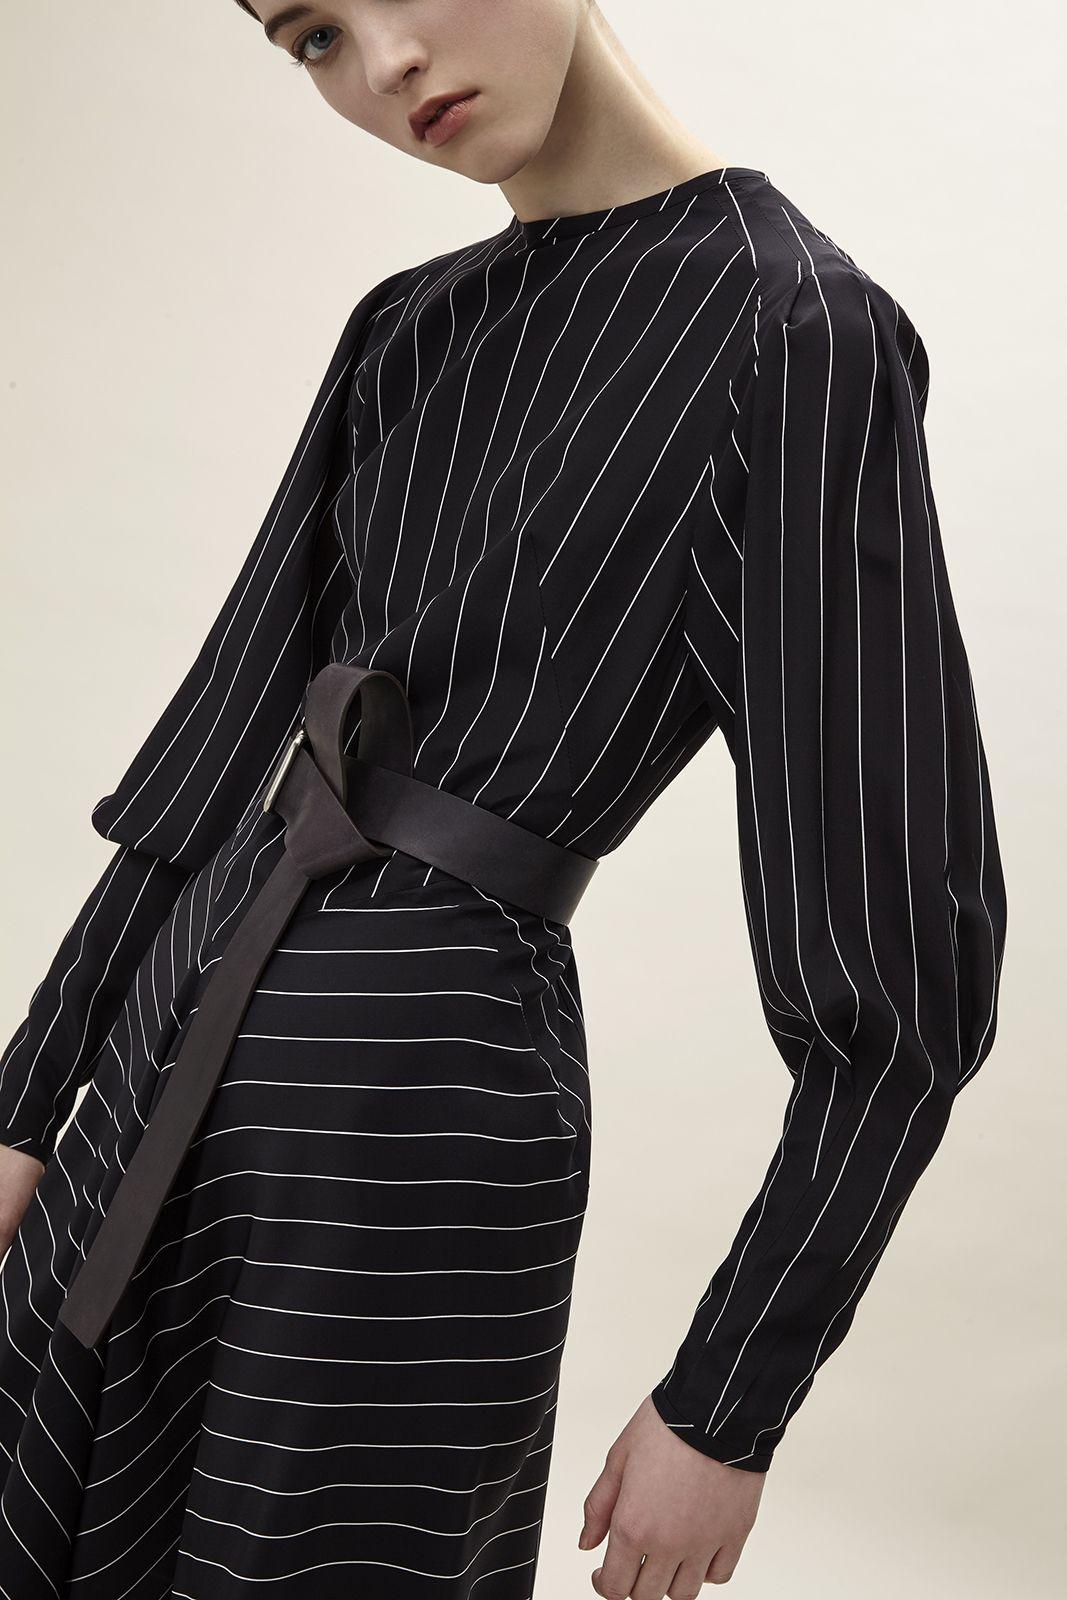 Striped silk dress. #aquilanorimondi #tommasoaquilano #robertorimondi #womenfashion #madeinitaly #italiandesign #silk